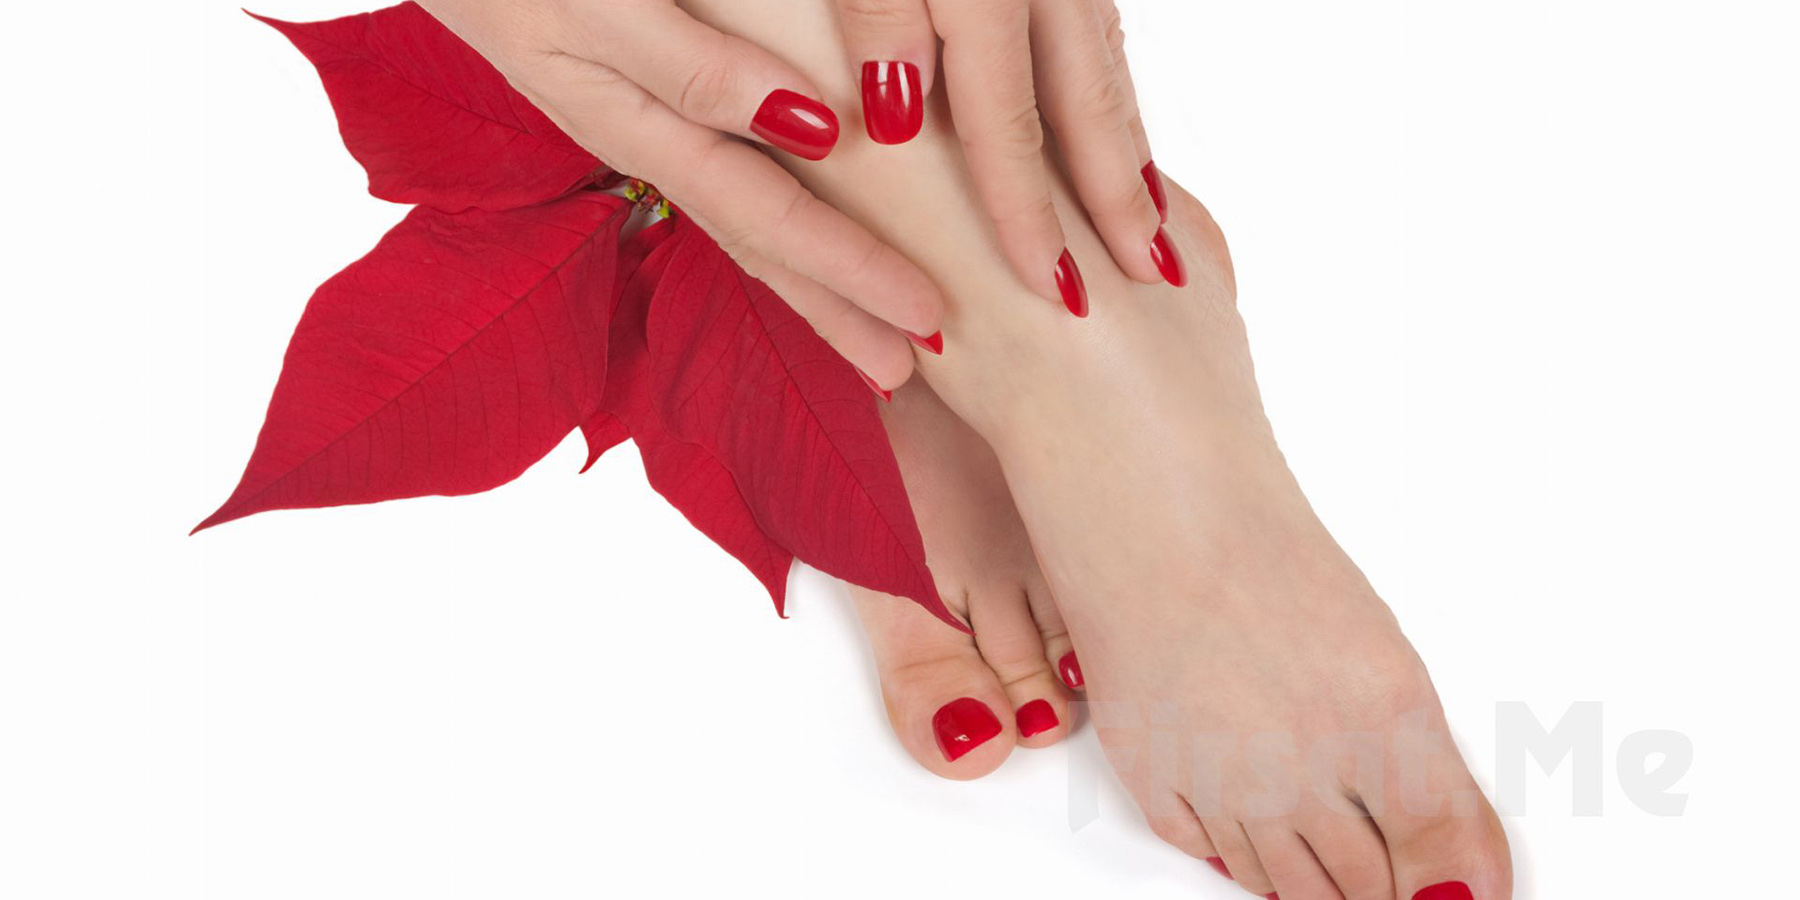 6 легких методов ухода за вашими ножками